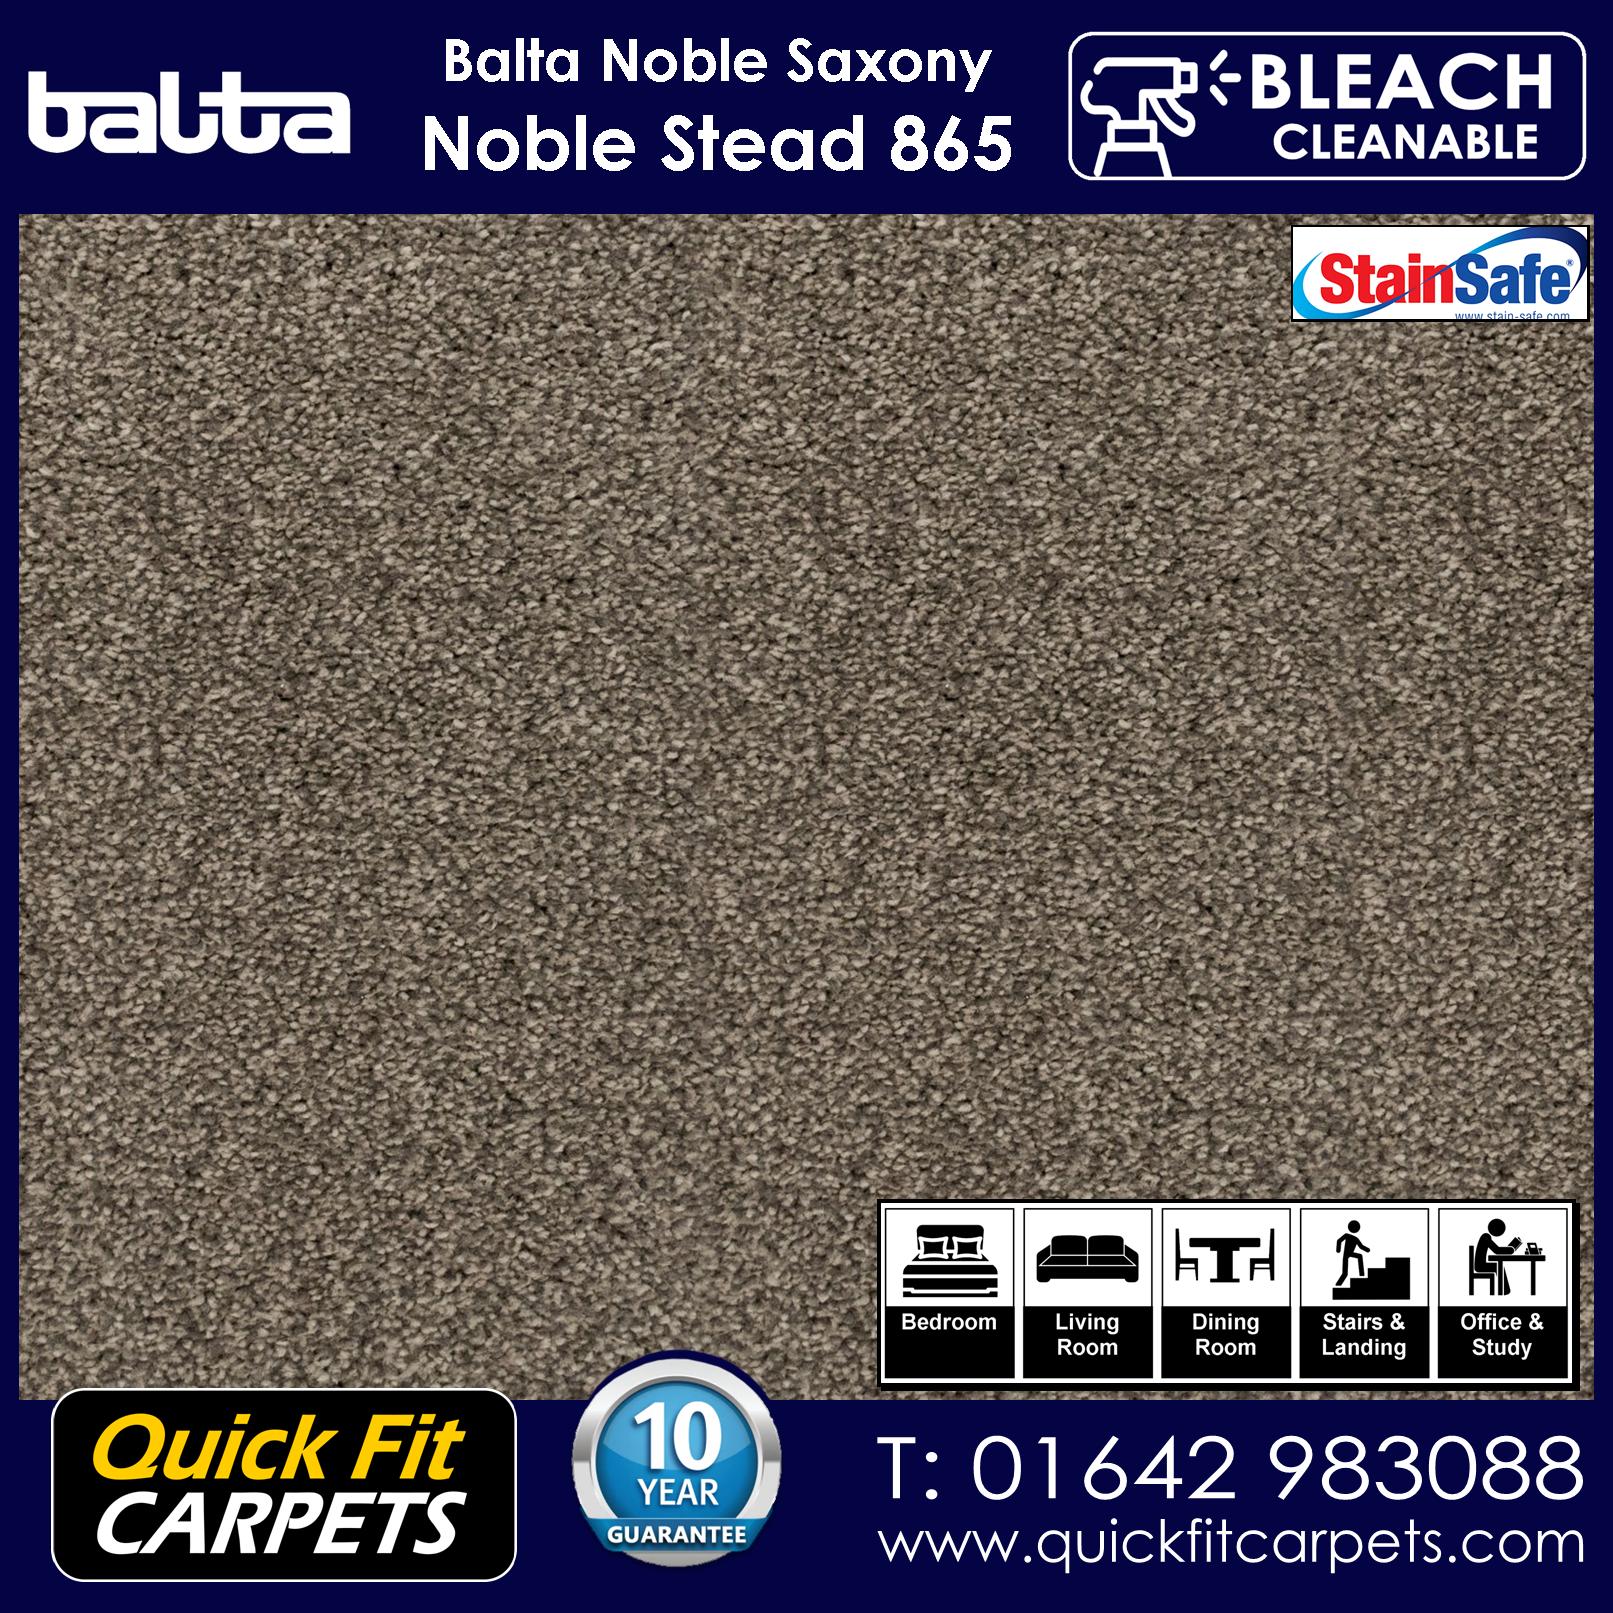 Quick Fit Carpets Balta Luxury Pile Noble Stead 865